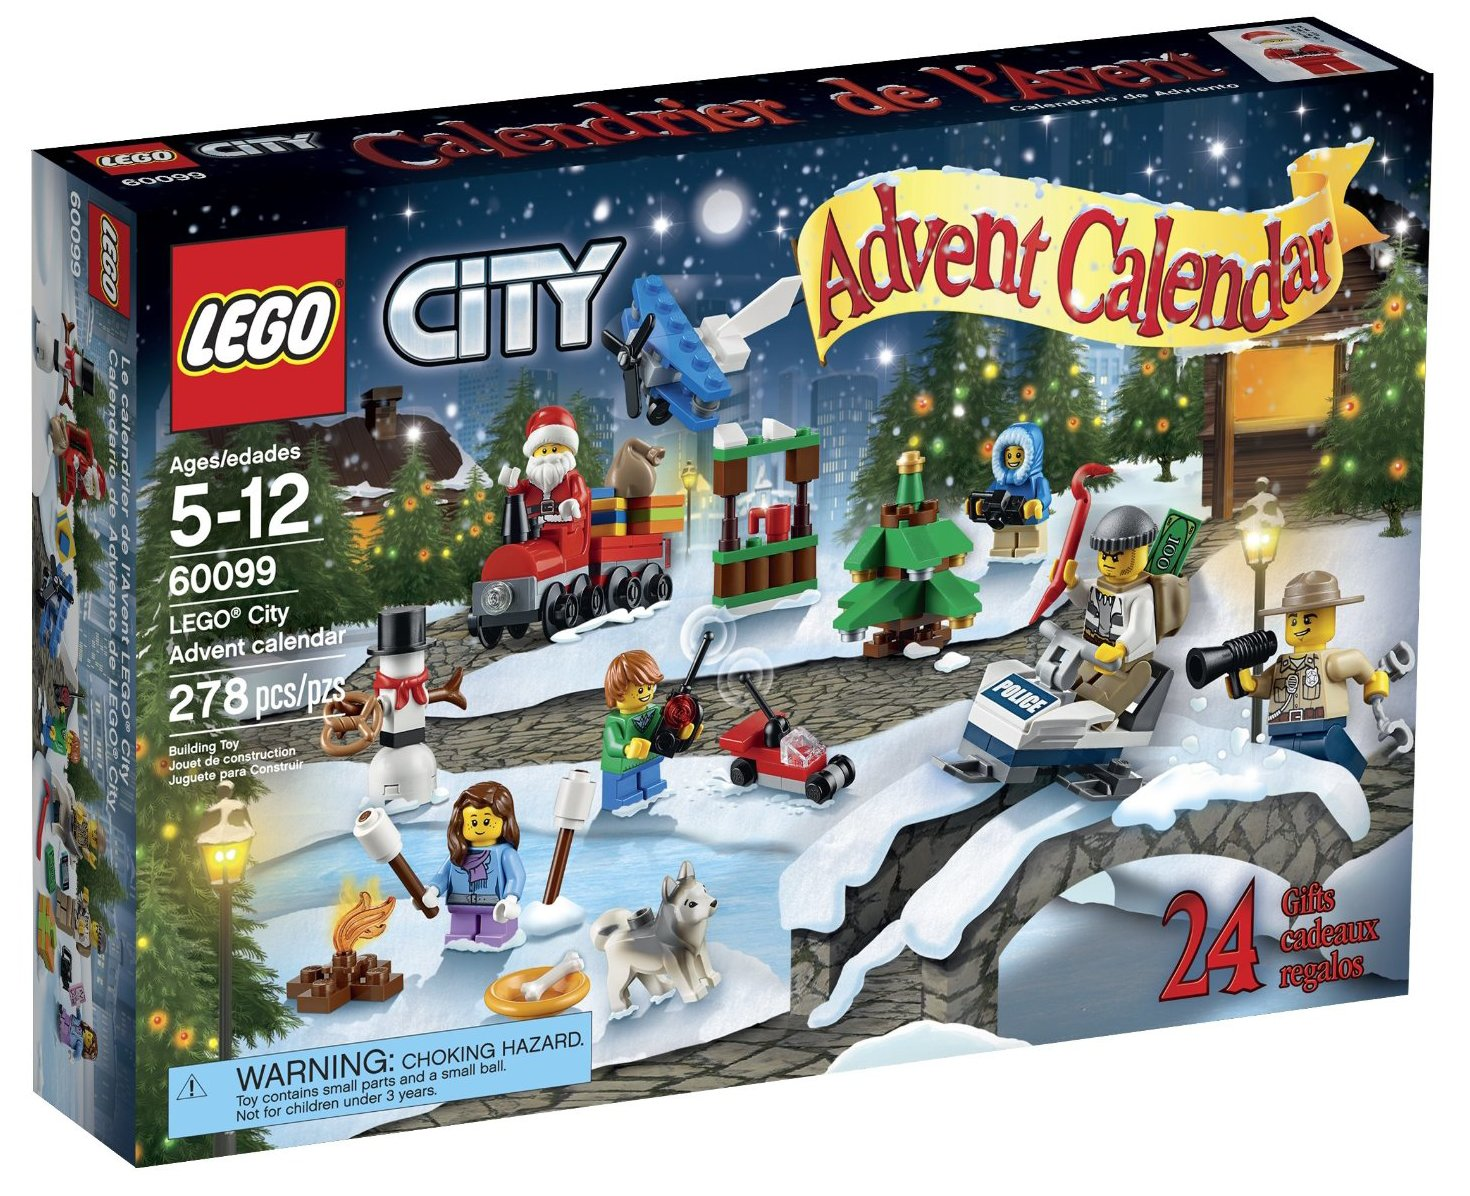 Advent Calendar Lego : Lego advent calendars up for order early bricks